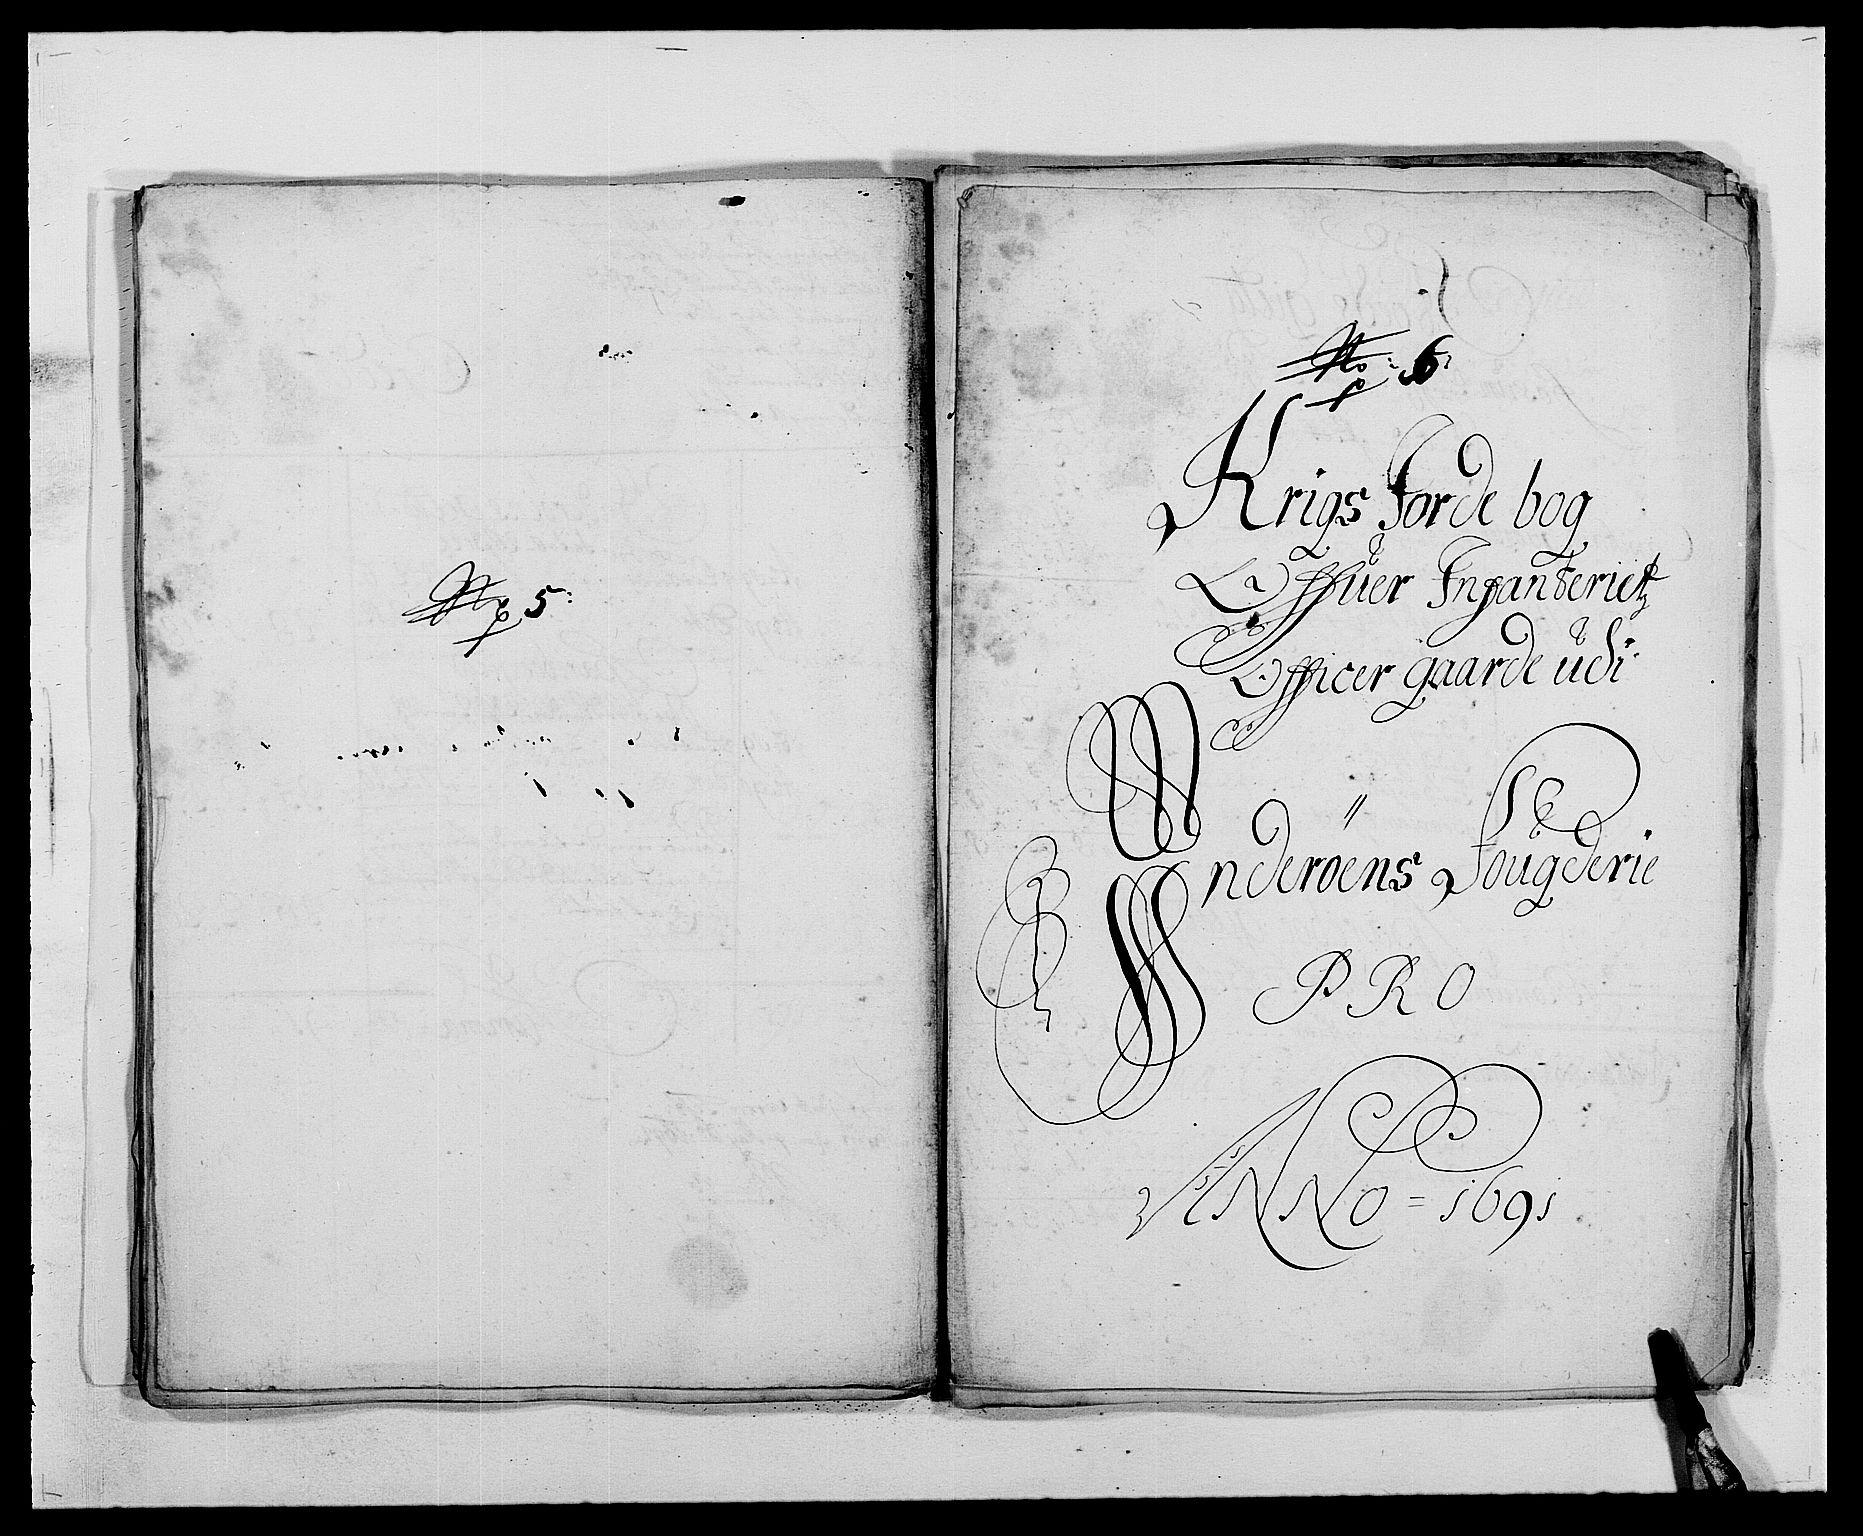 RA, Rentekammeret inntil 1814, Reviderte regnskaper, Fogderegnskap, R63/L4307: Fogderegnskap Inderøy, 1690-1691, s. 436